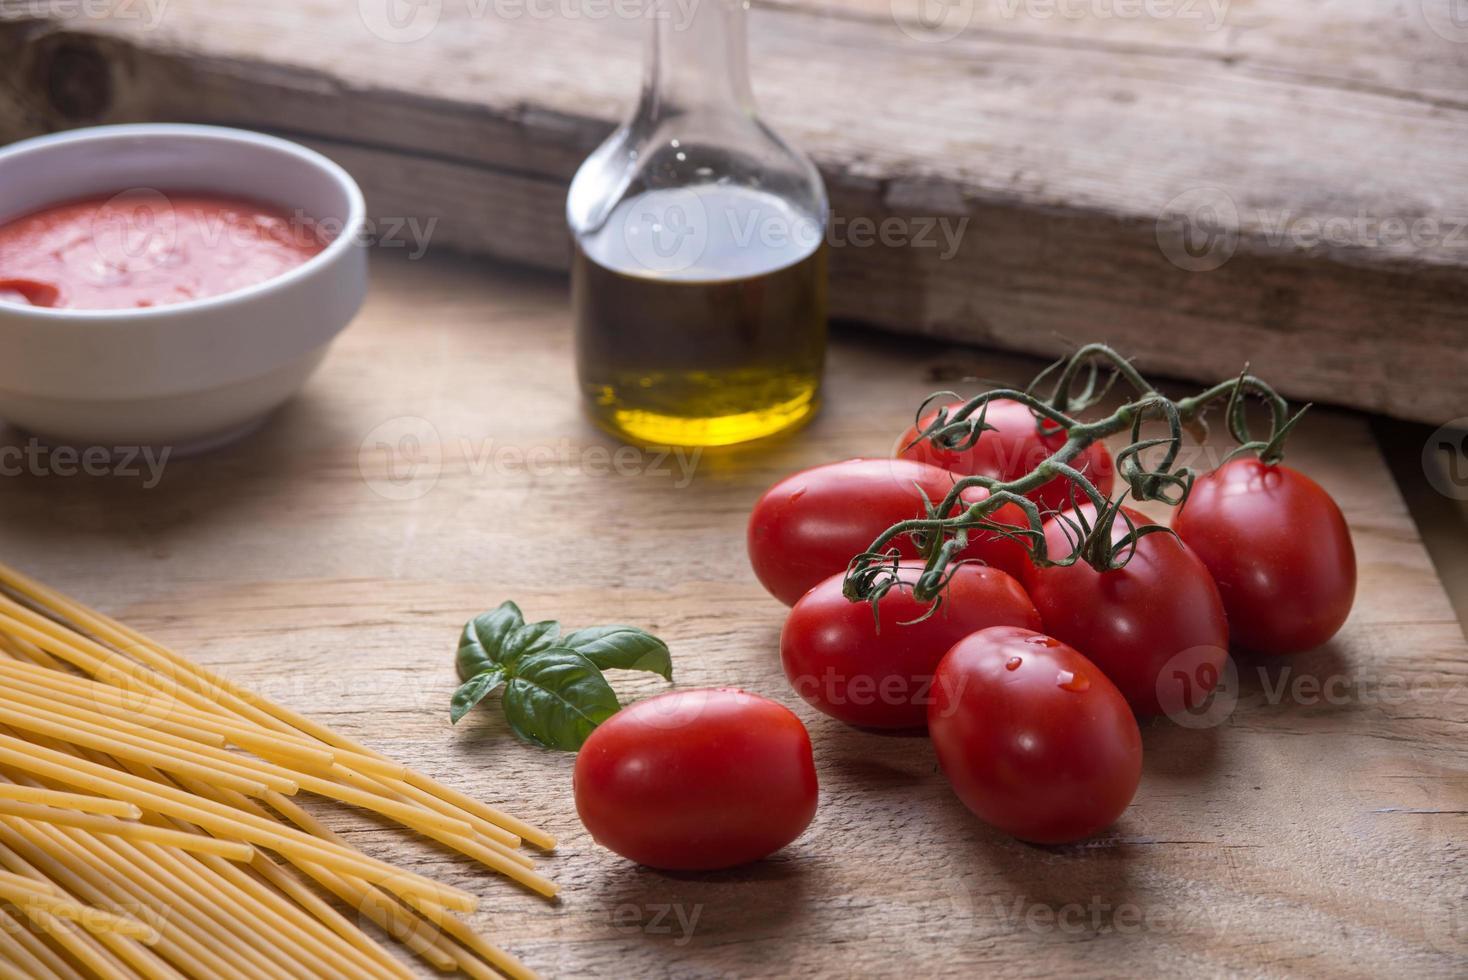 receta mediterránea foto